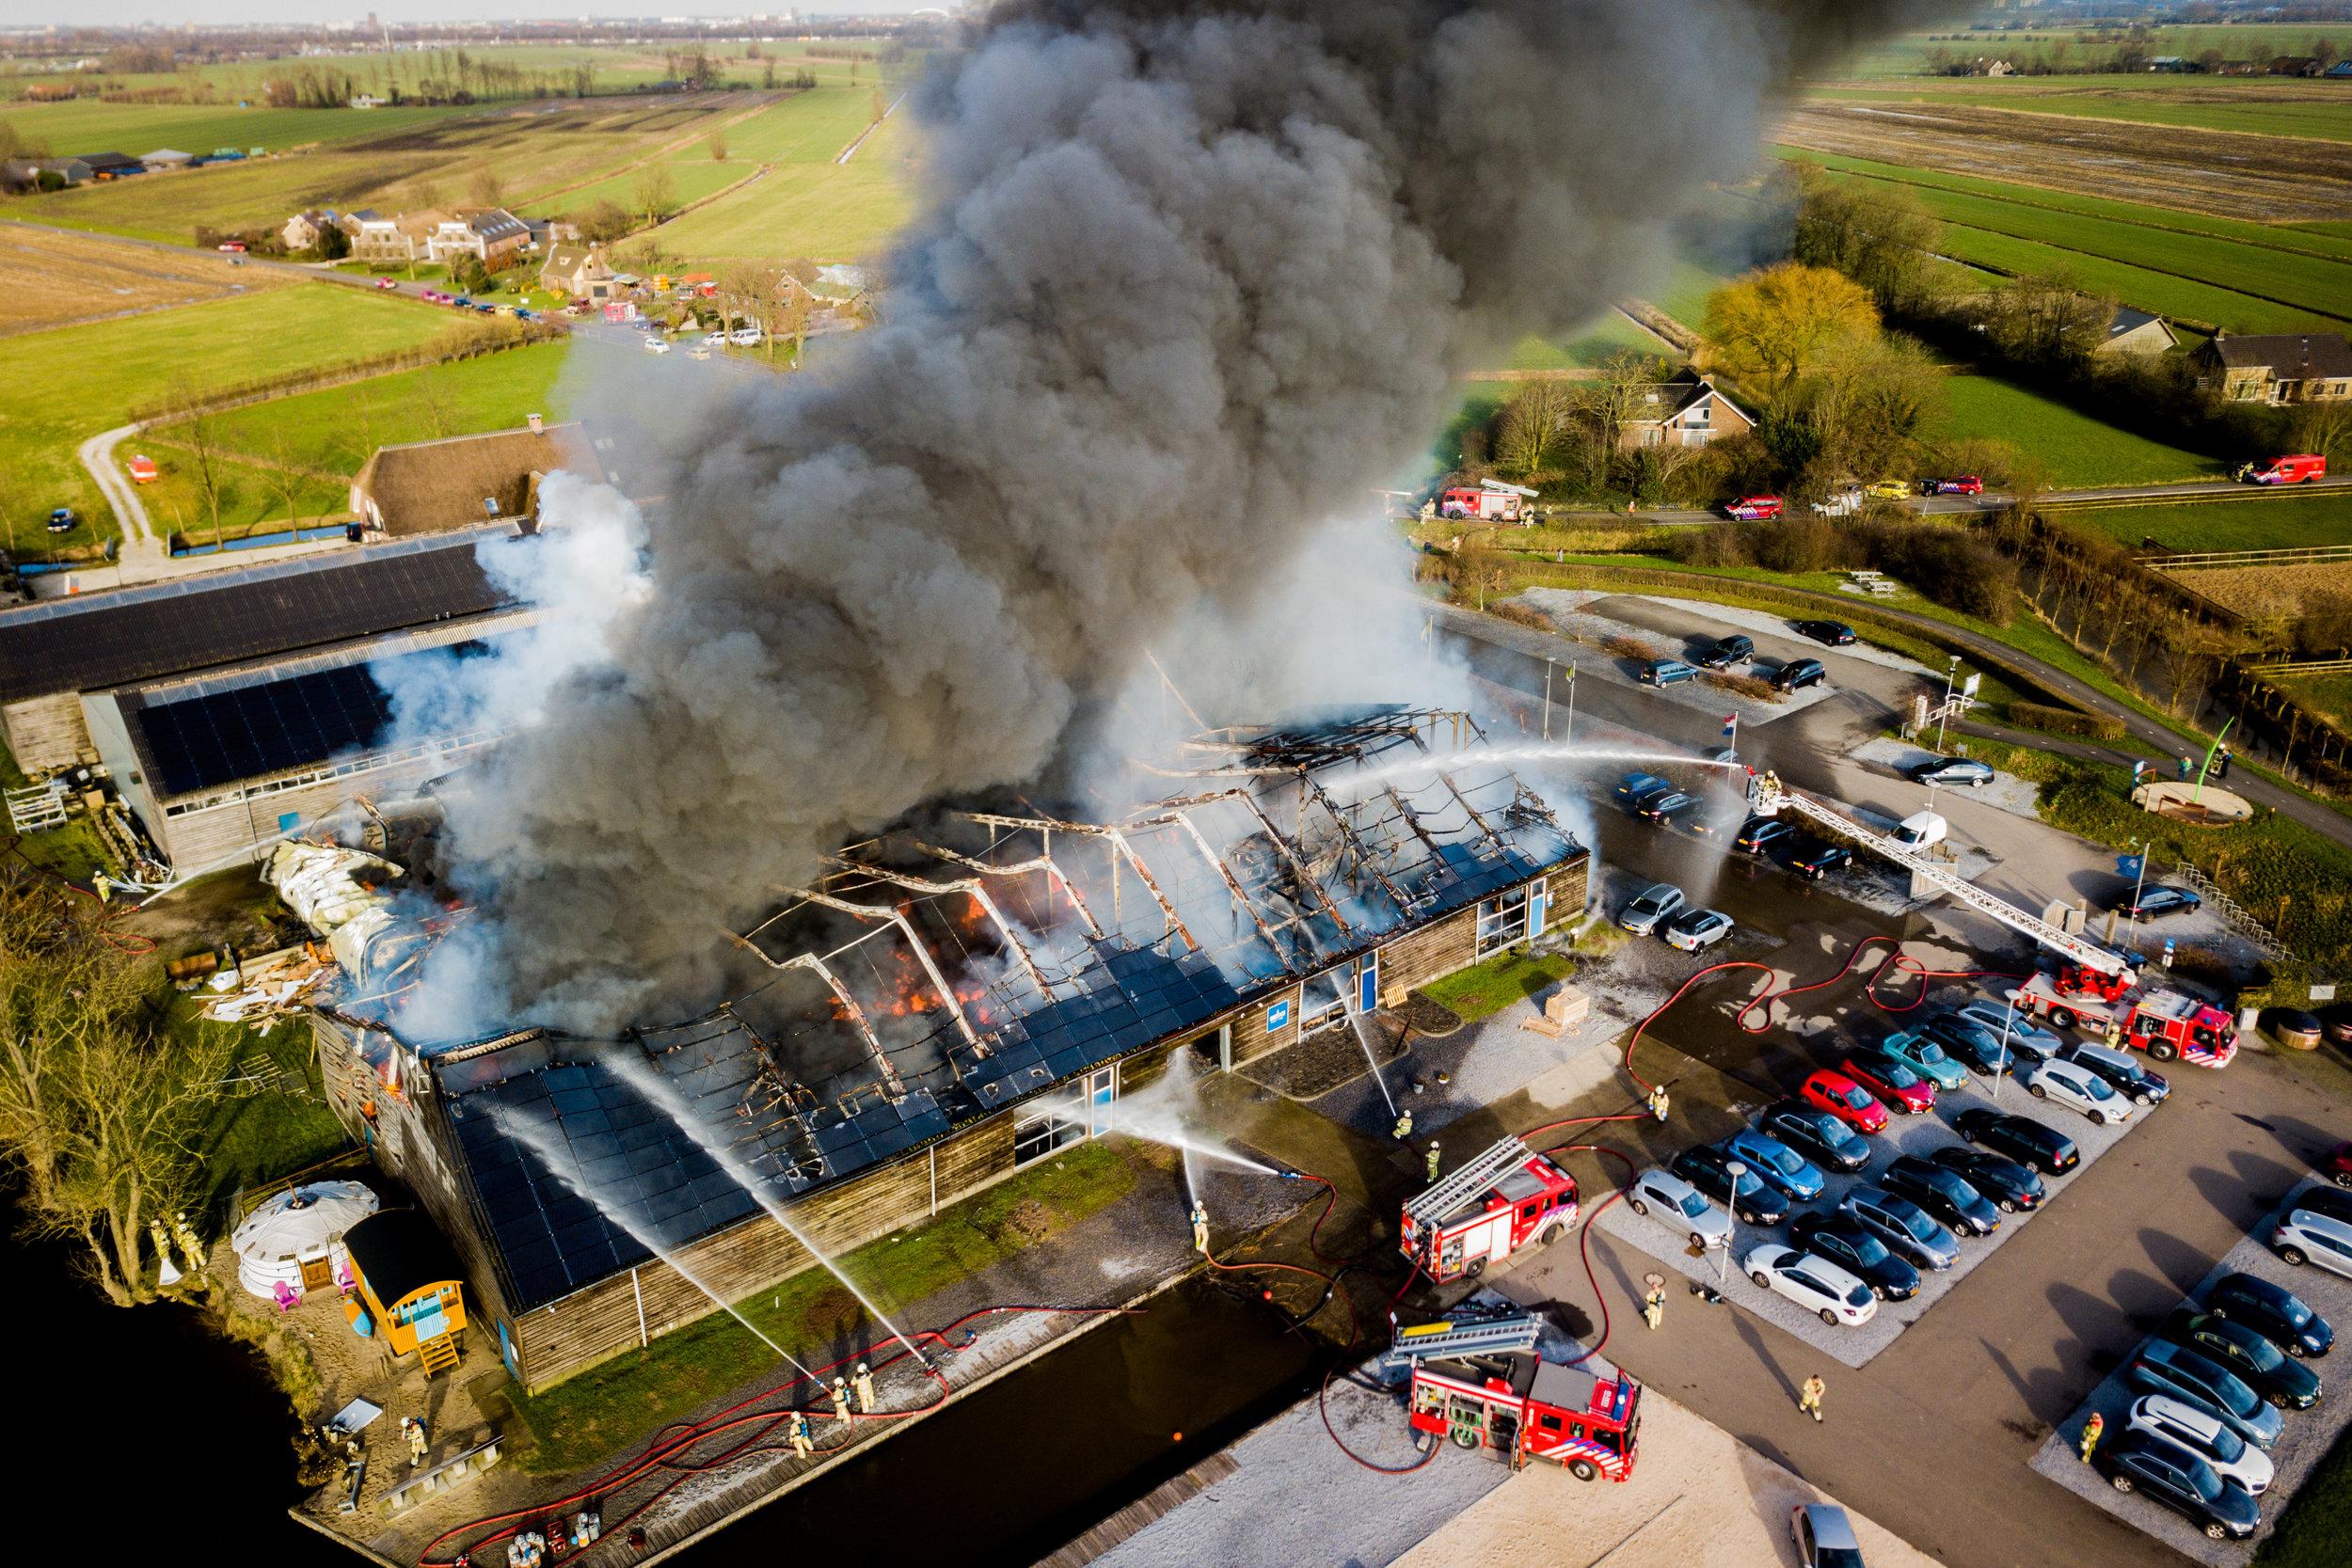 Grote brand verwoest botenloodsen in IJsselstein